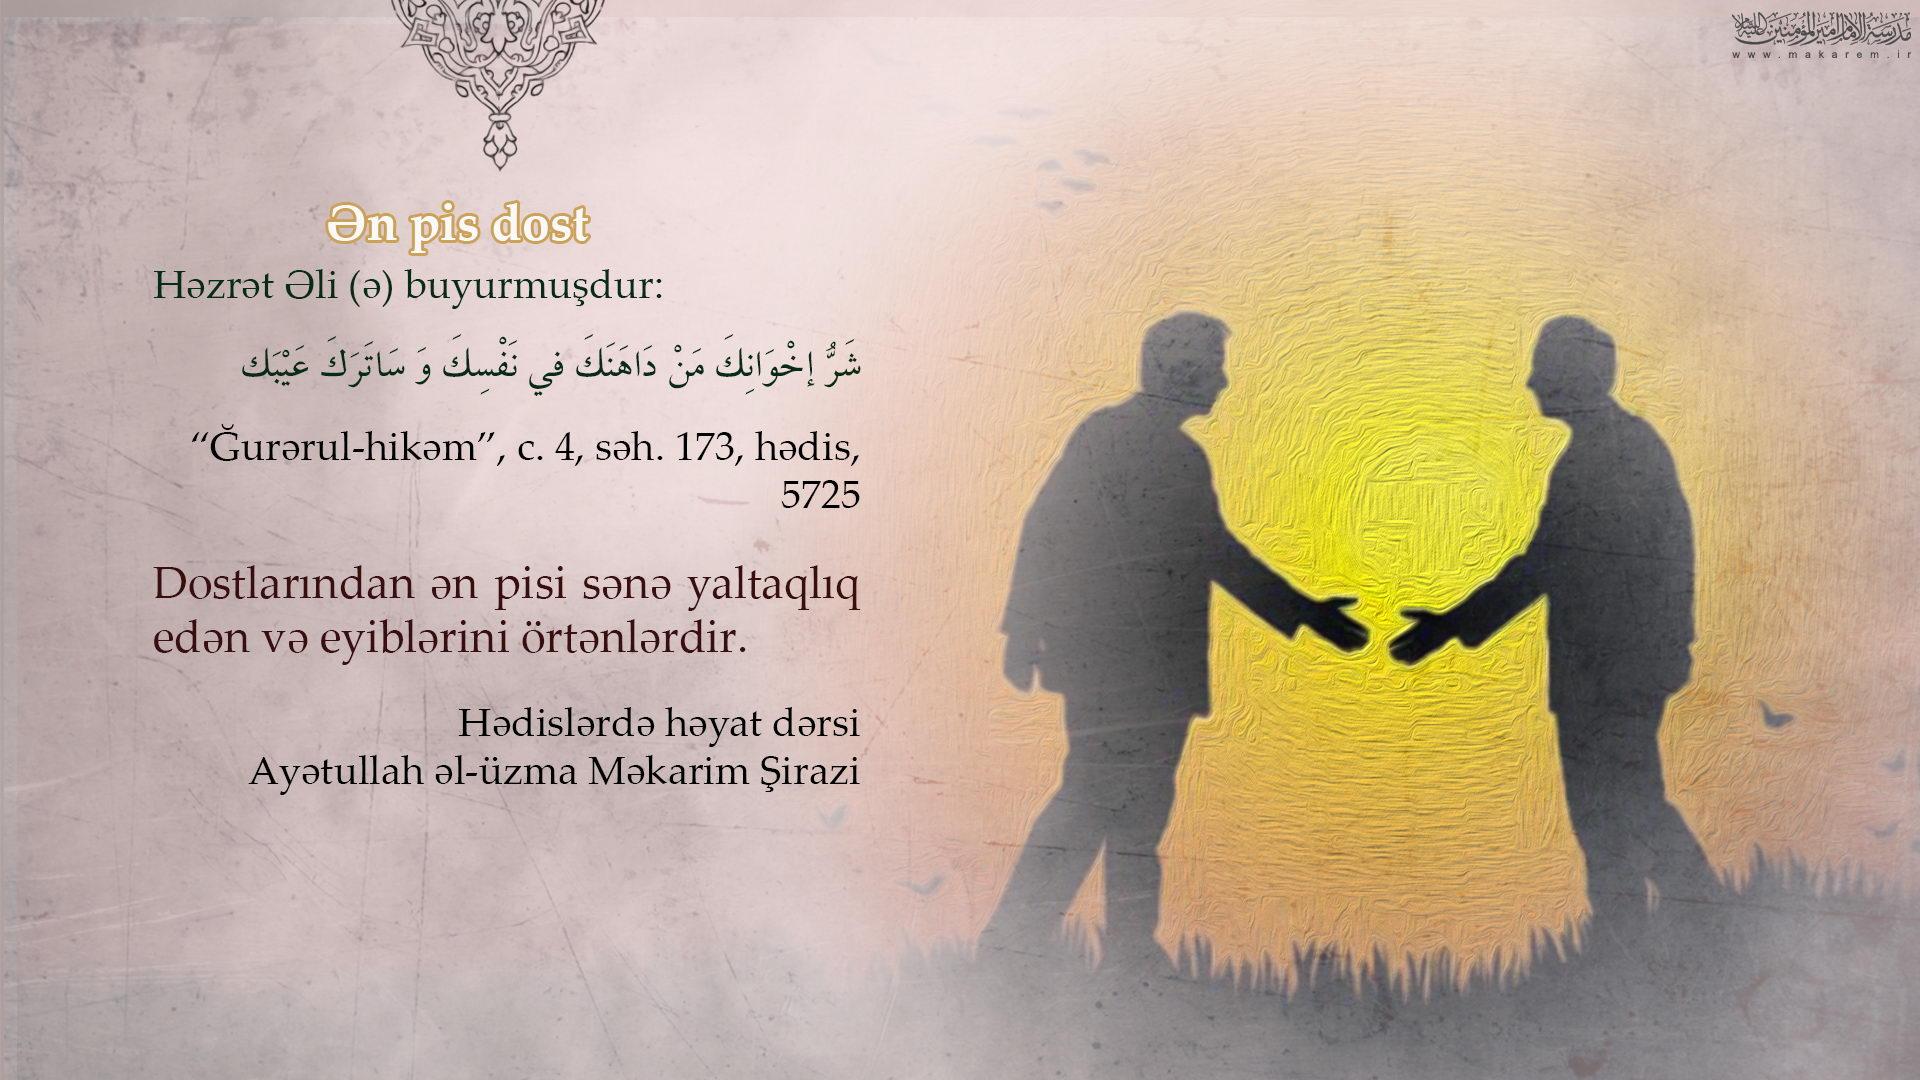 150-018-مدرسه الامام امیر المومنین (ع)